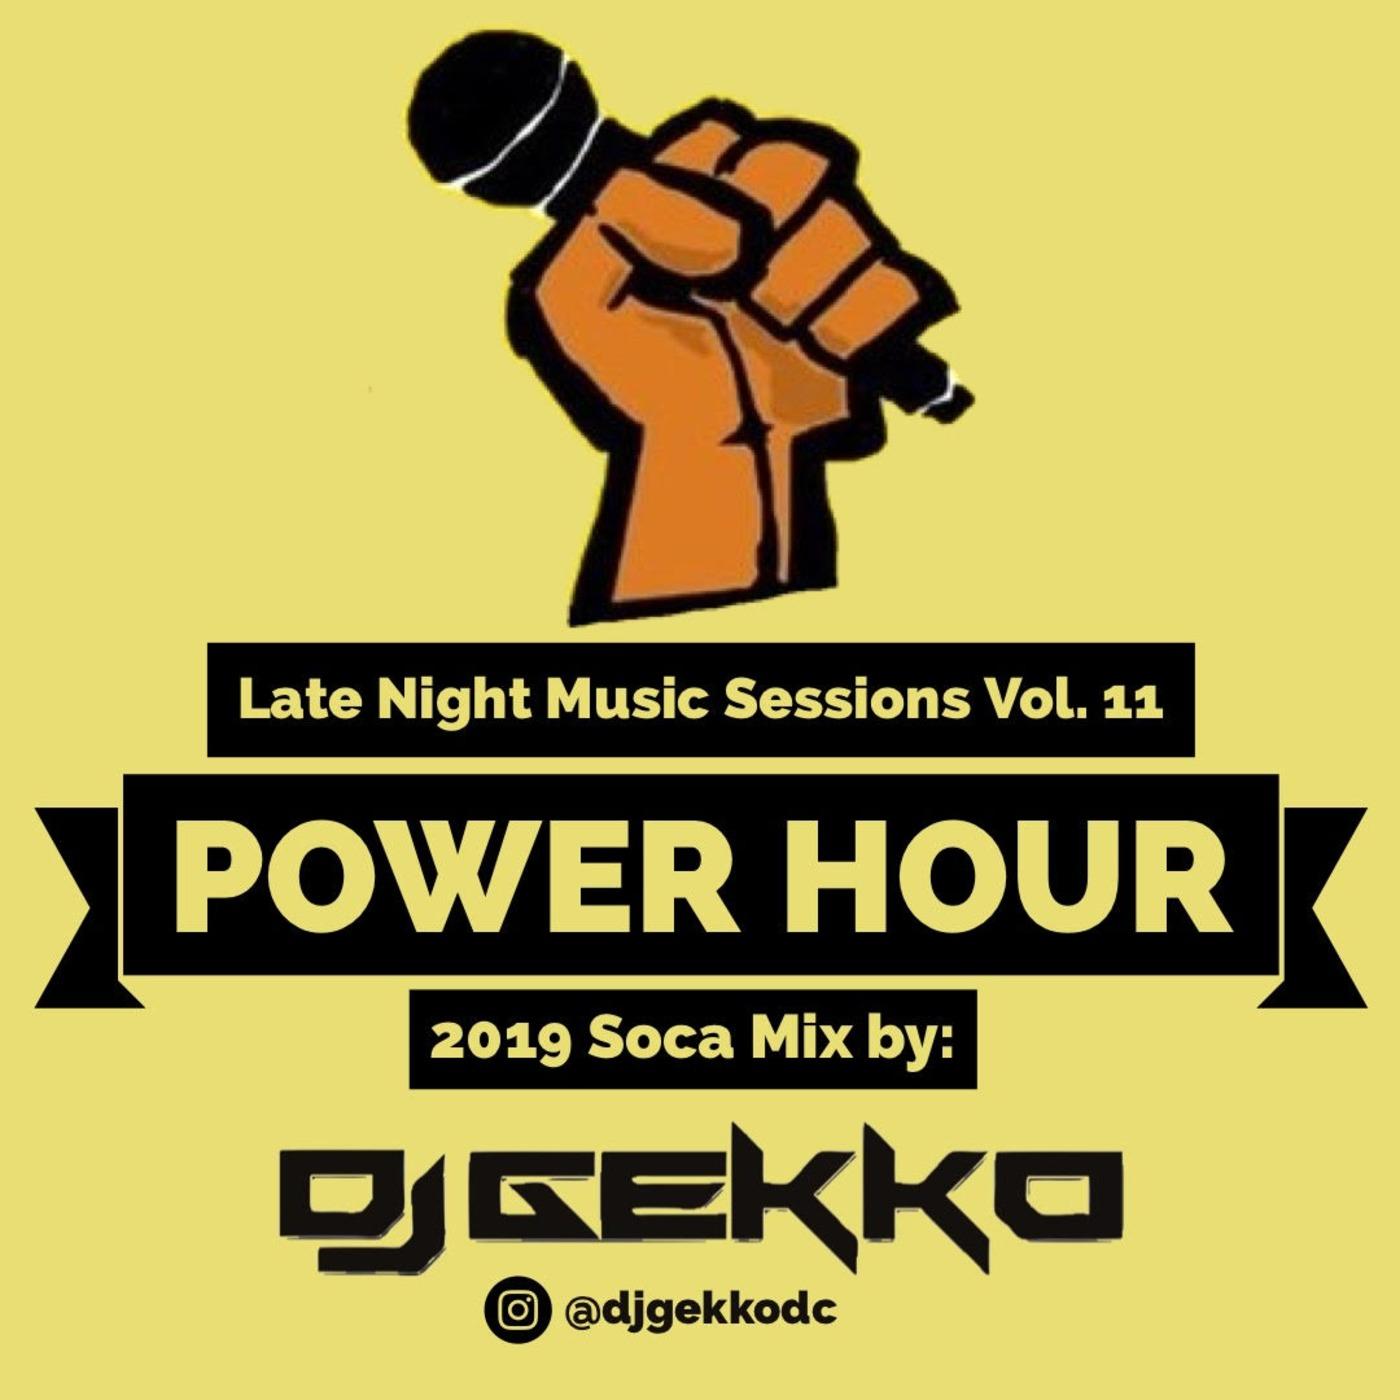 Late Night Music Sessions Vol  11 (Power Hour - 2019 Soca Mix) DJ